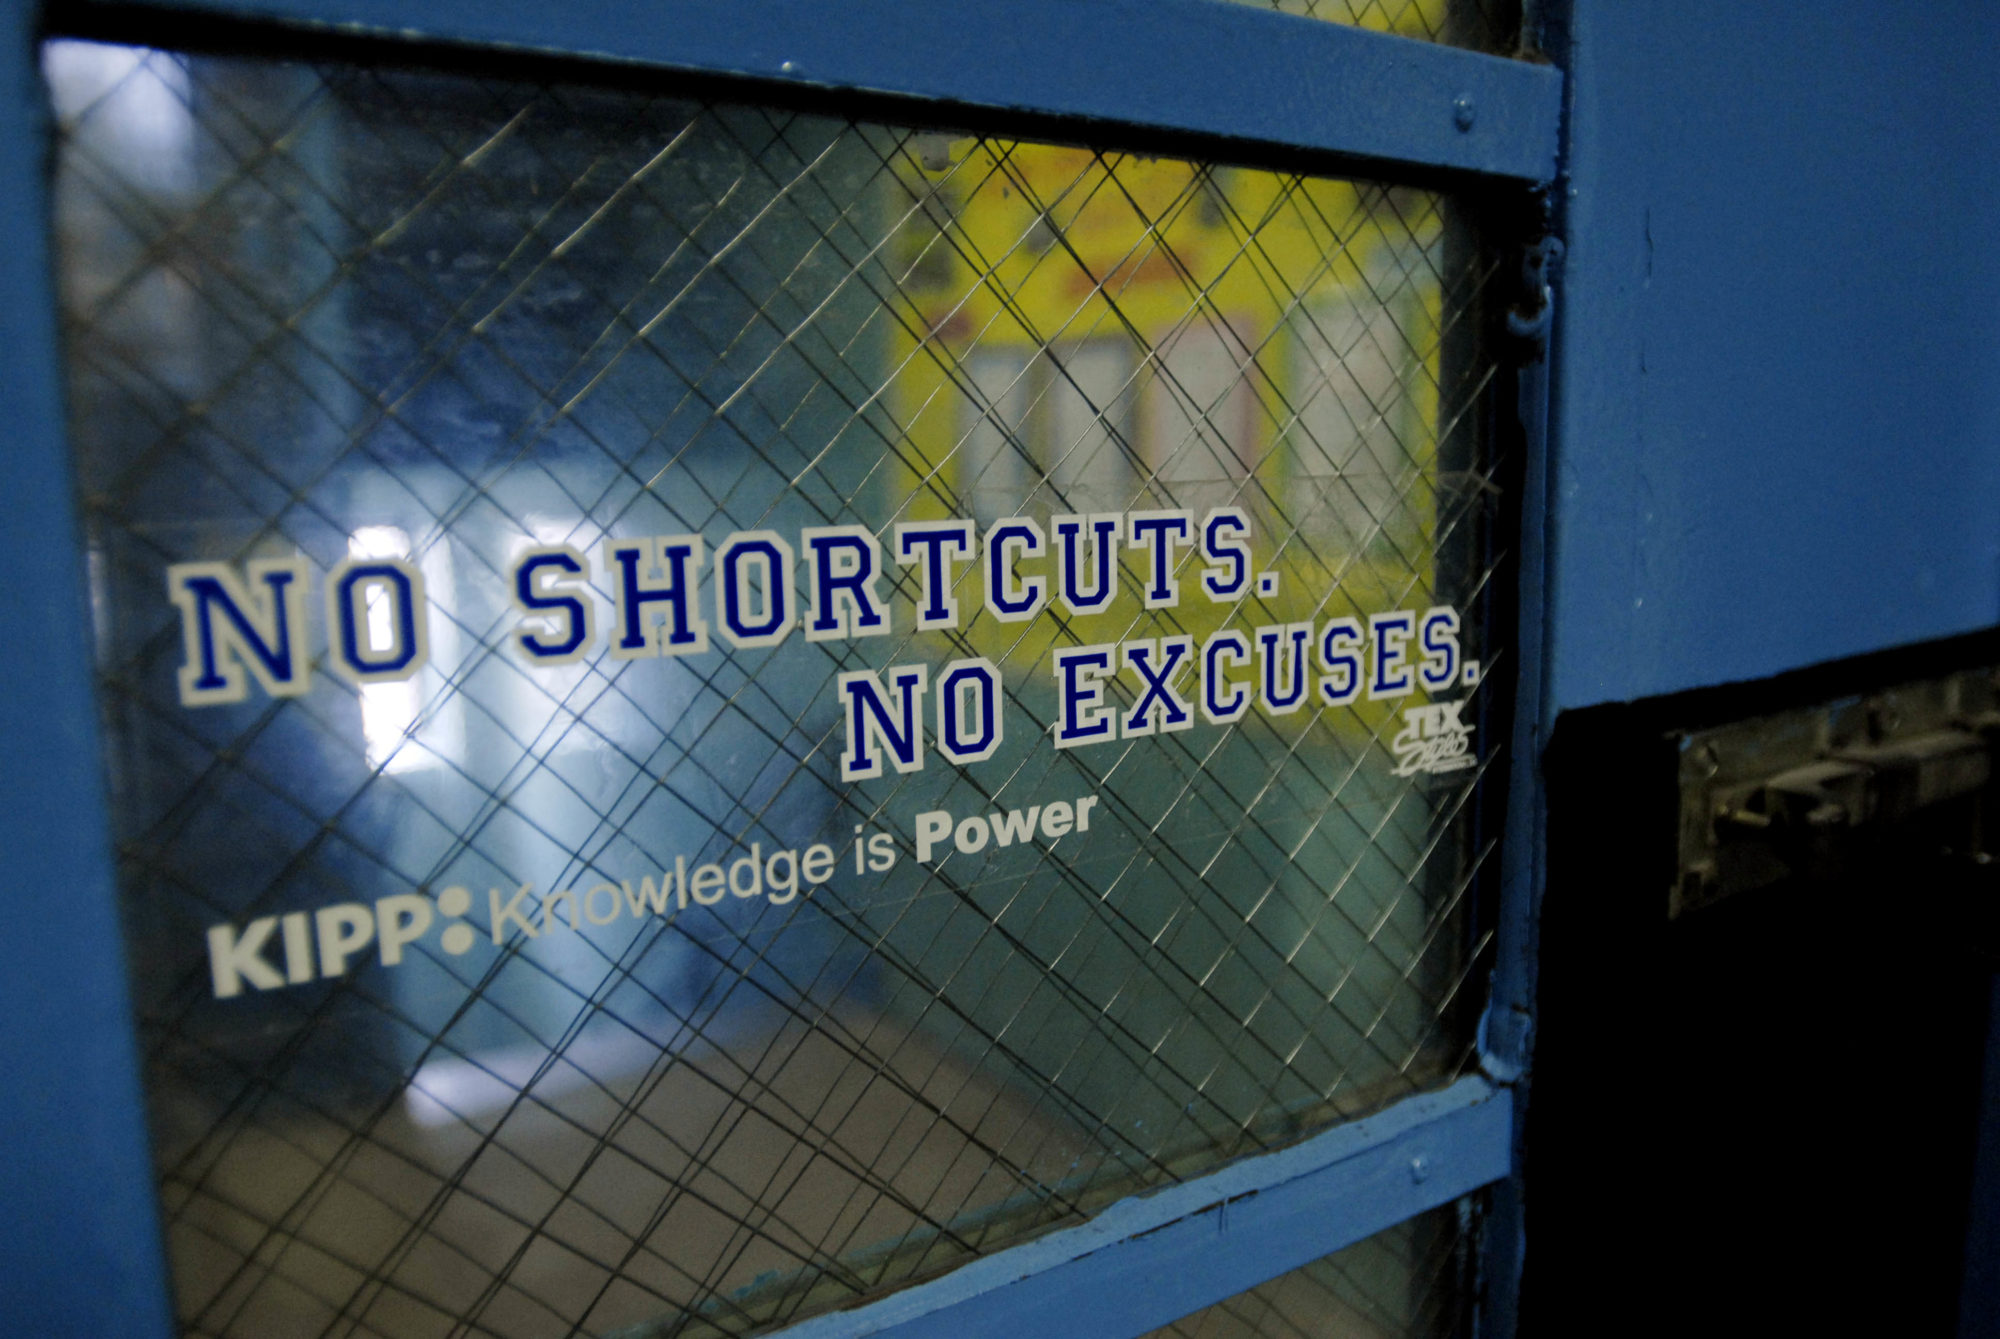 OPINION: No-excuses charter schools rethink discipline